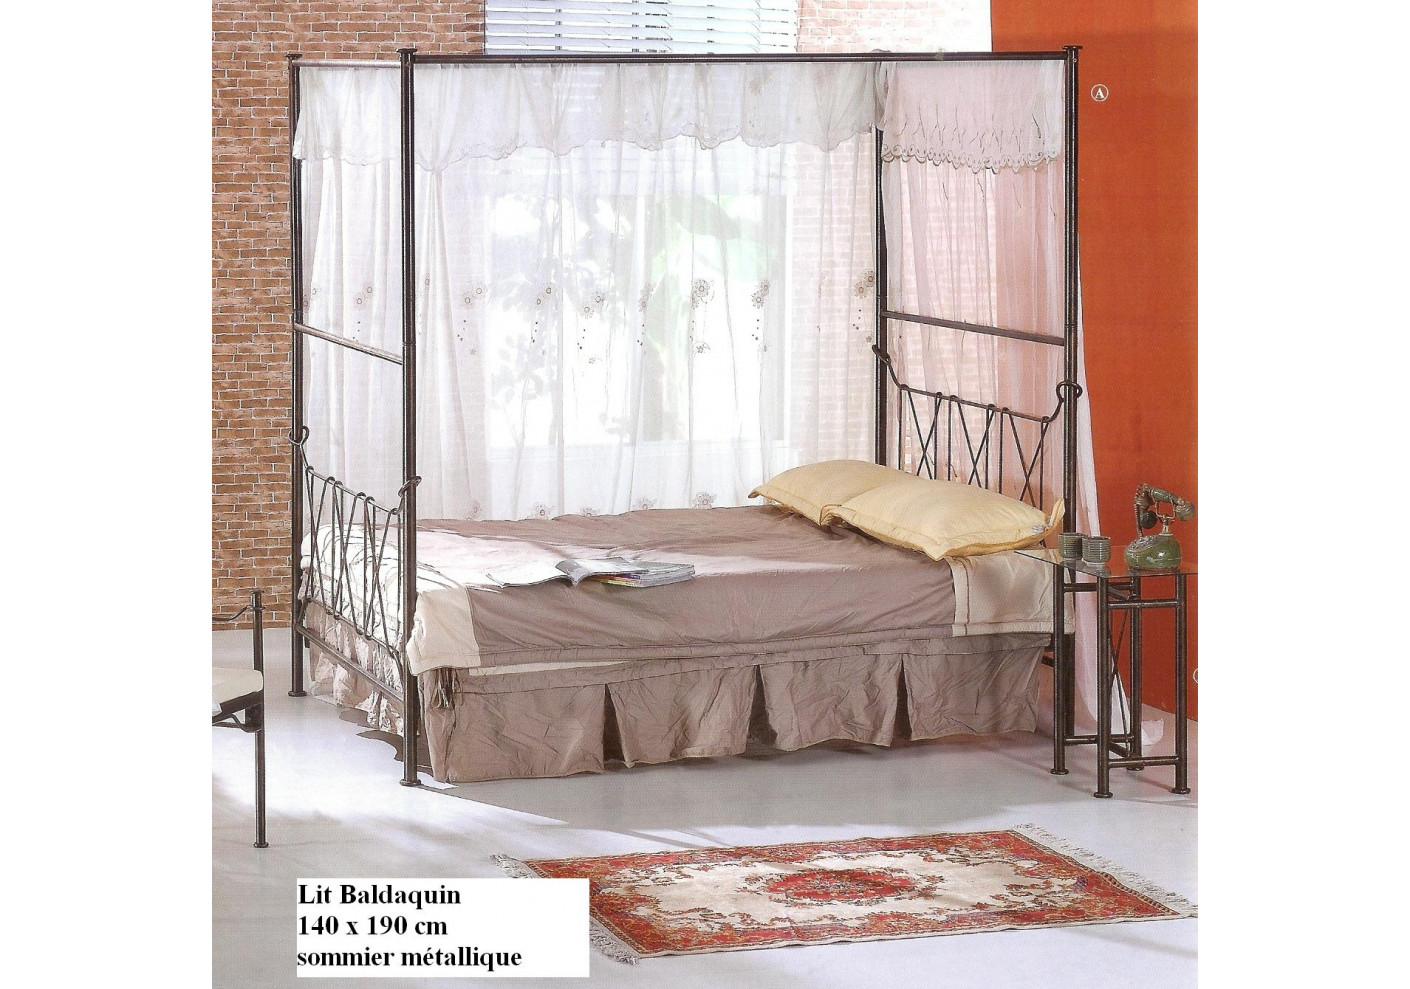 lit baldaquin bronze 140x190 cm. Black Bedroom Furniture Sets. Home Design Ideas